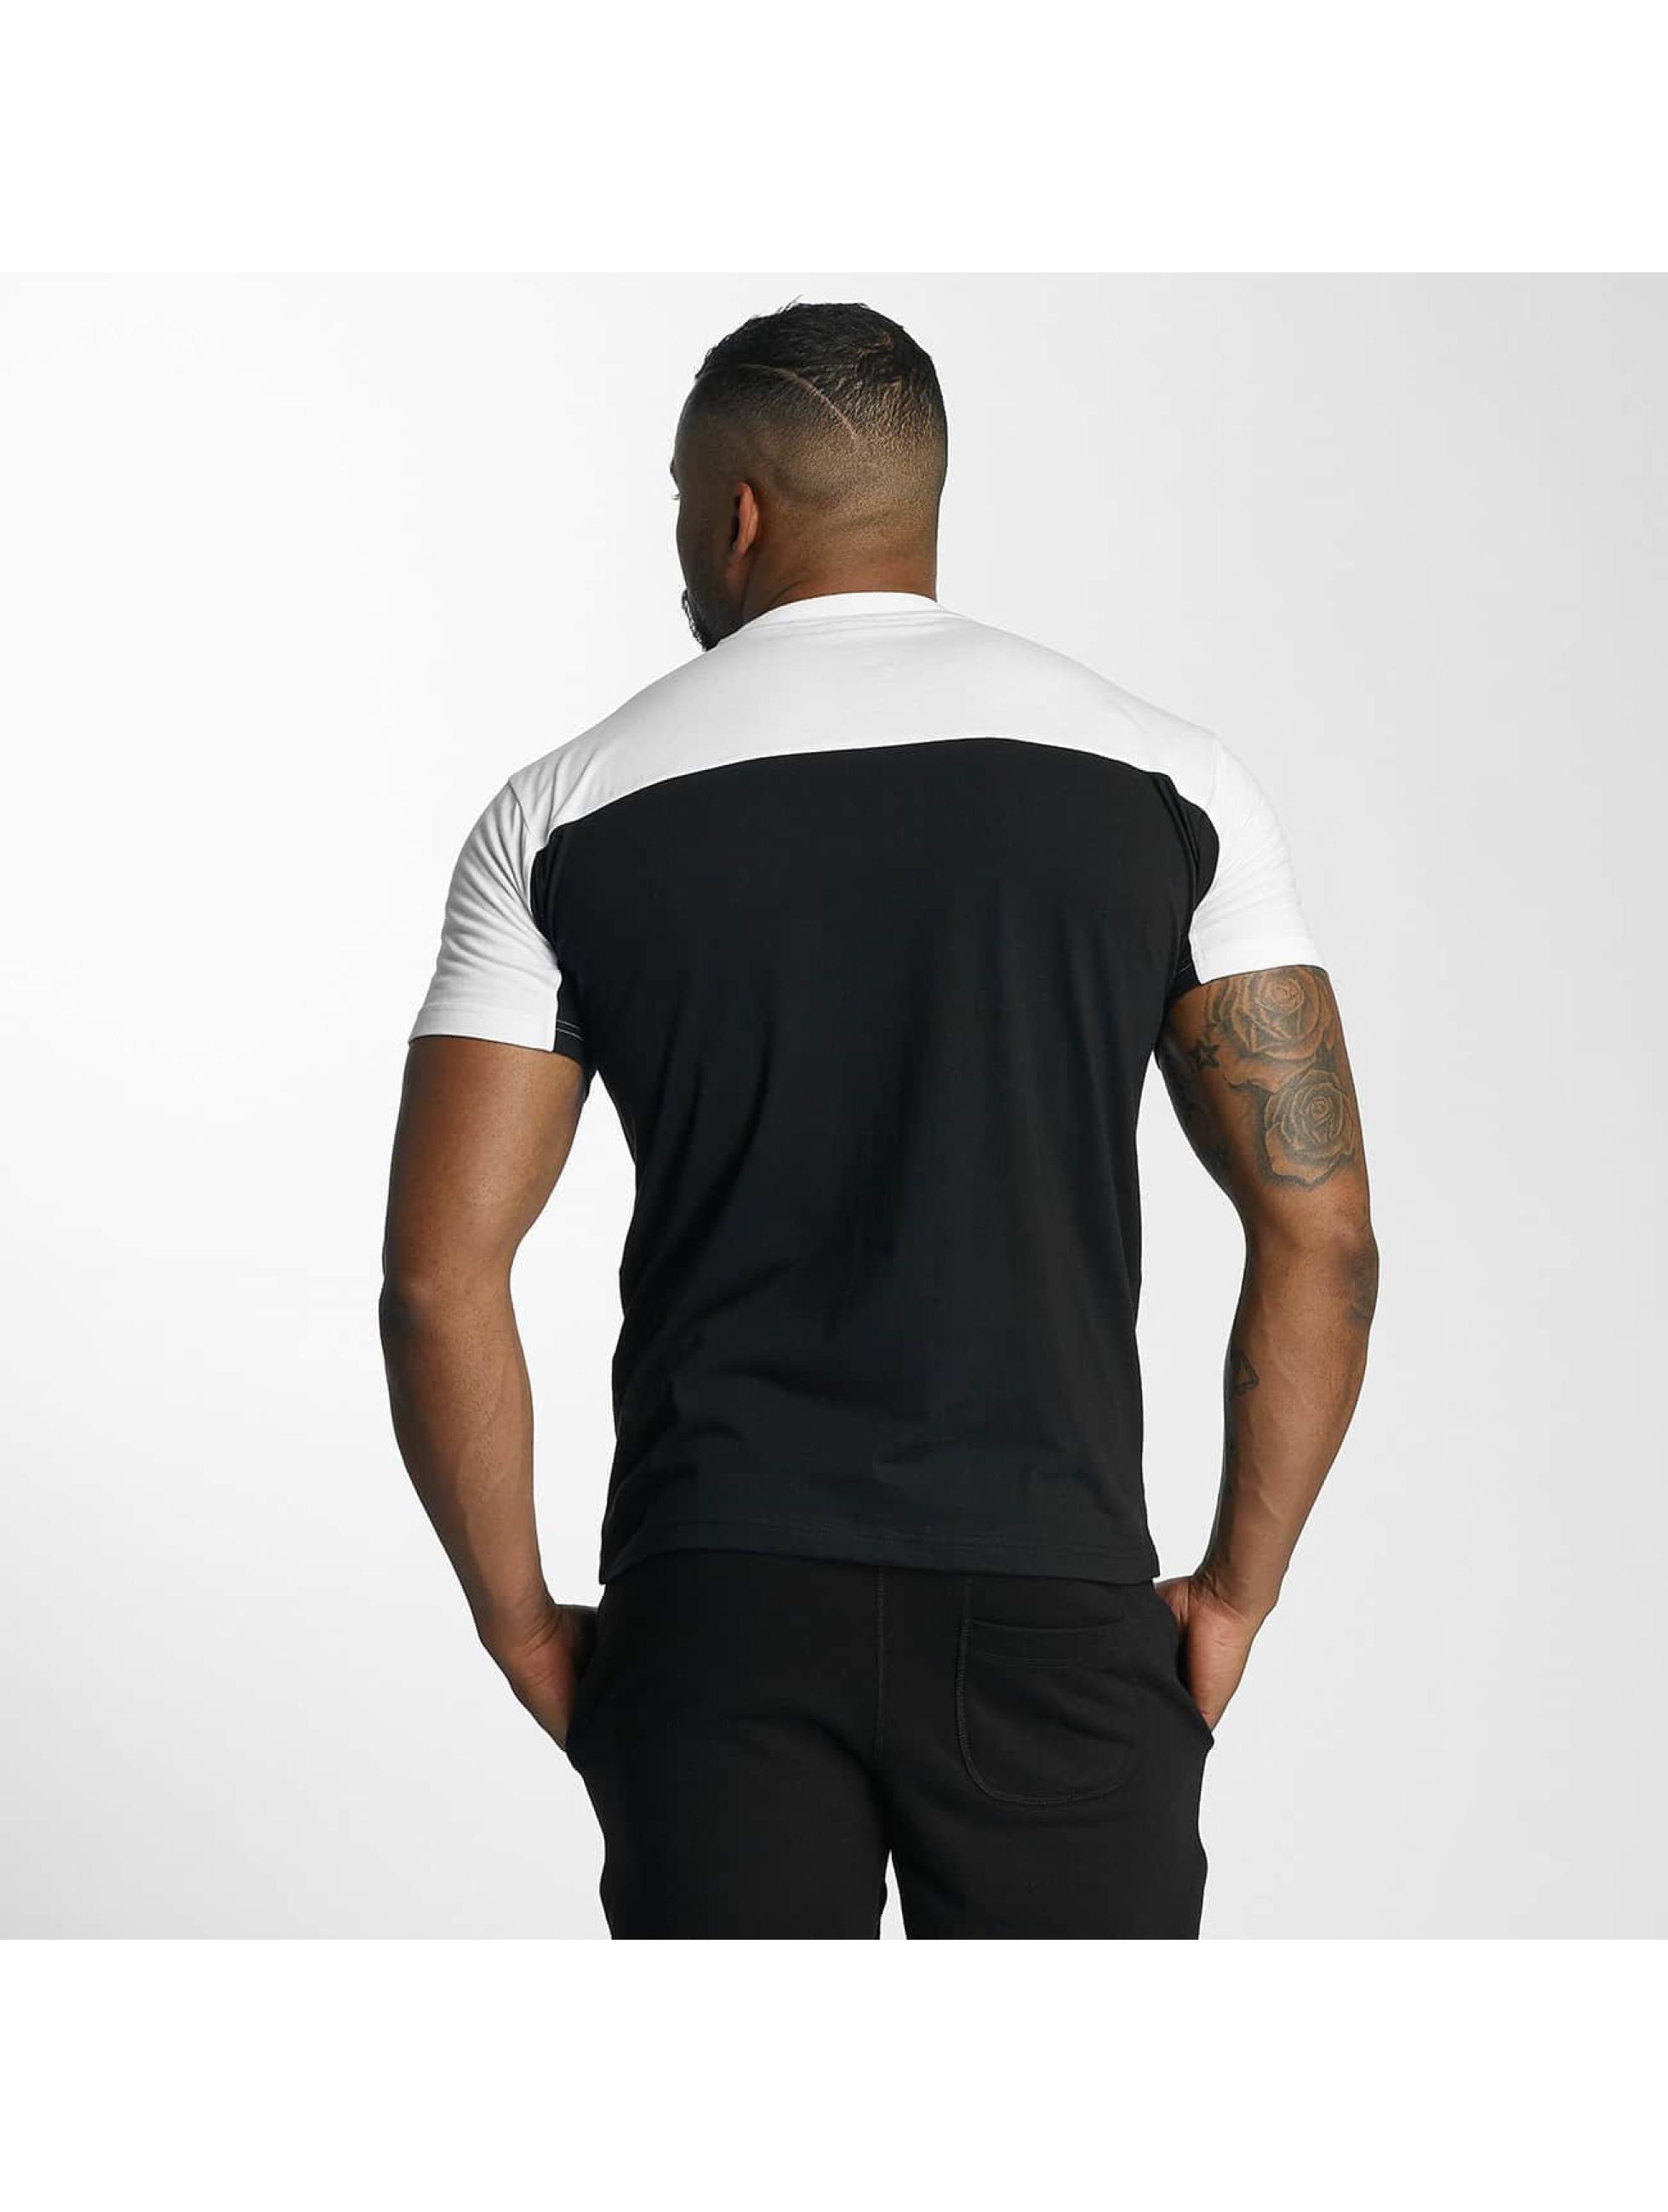 Pusher Apparel T-shirt 137 Rio nero